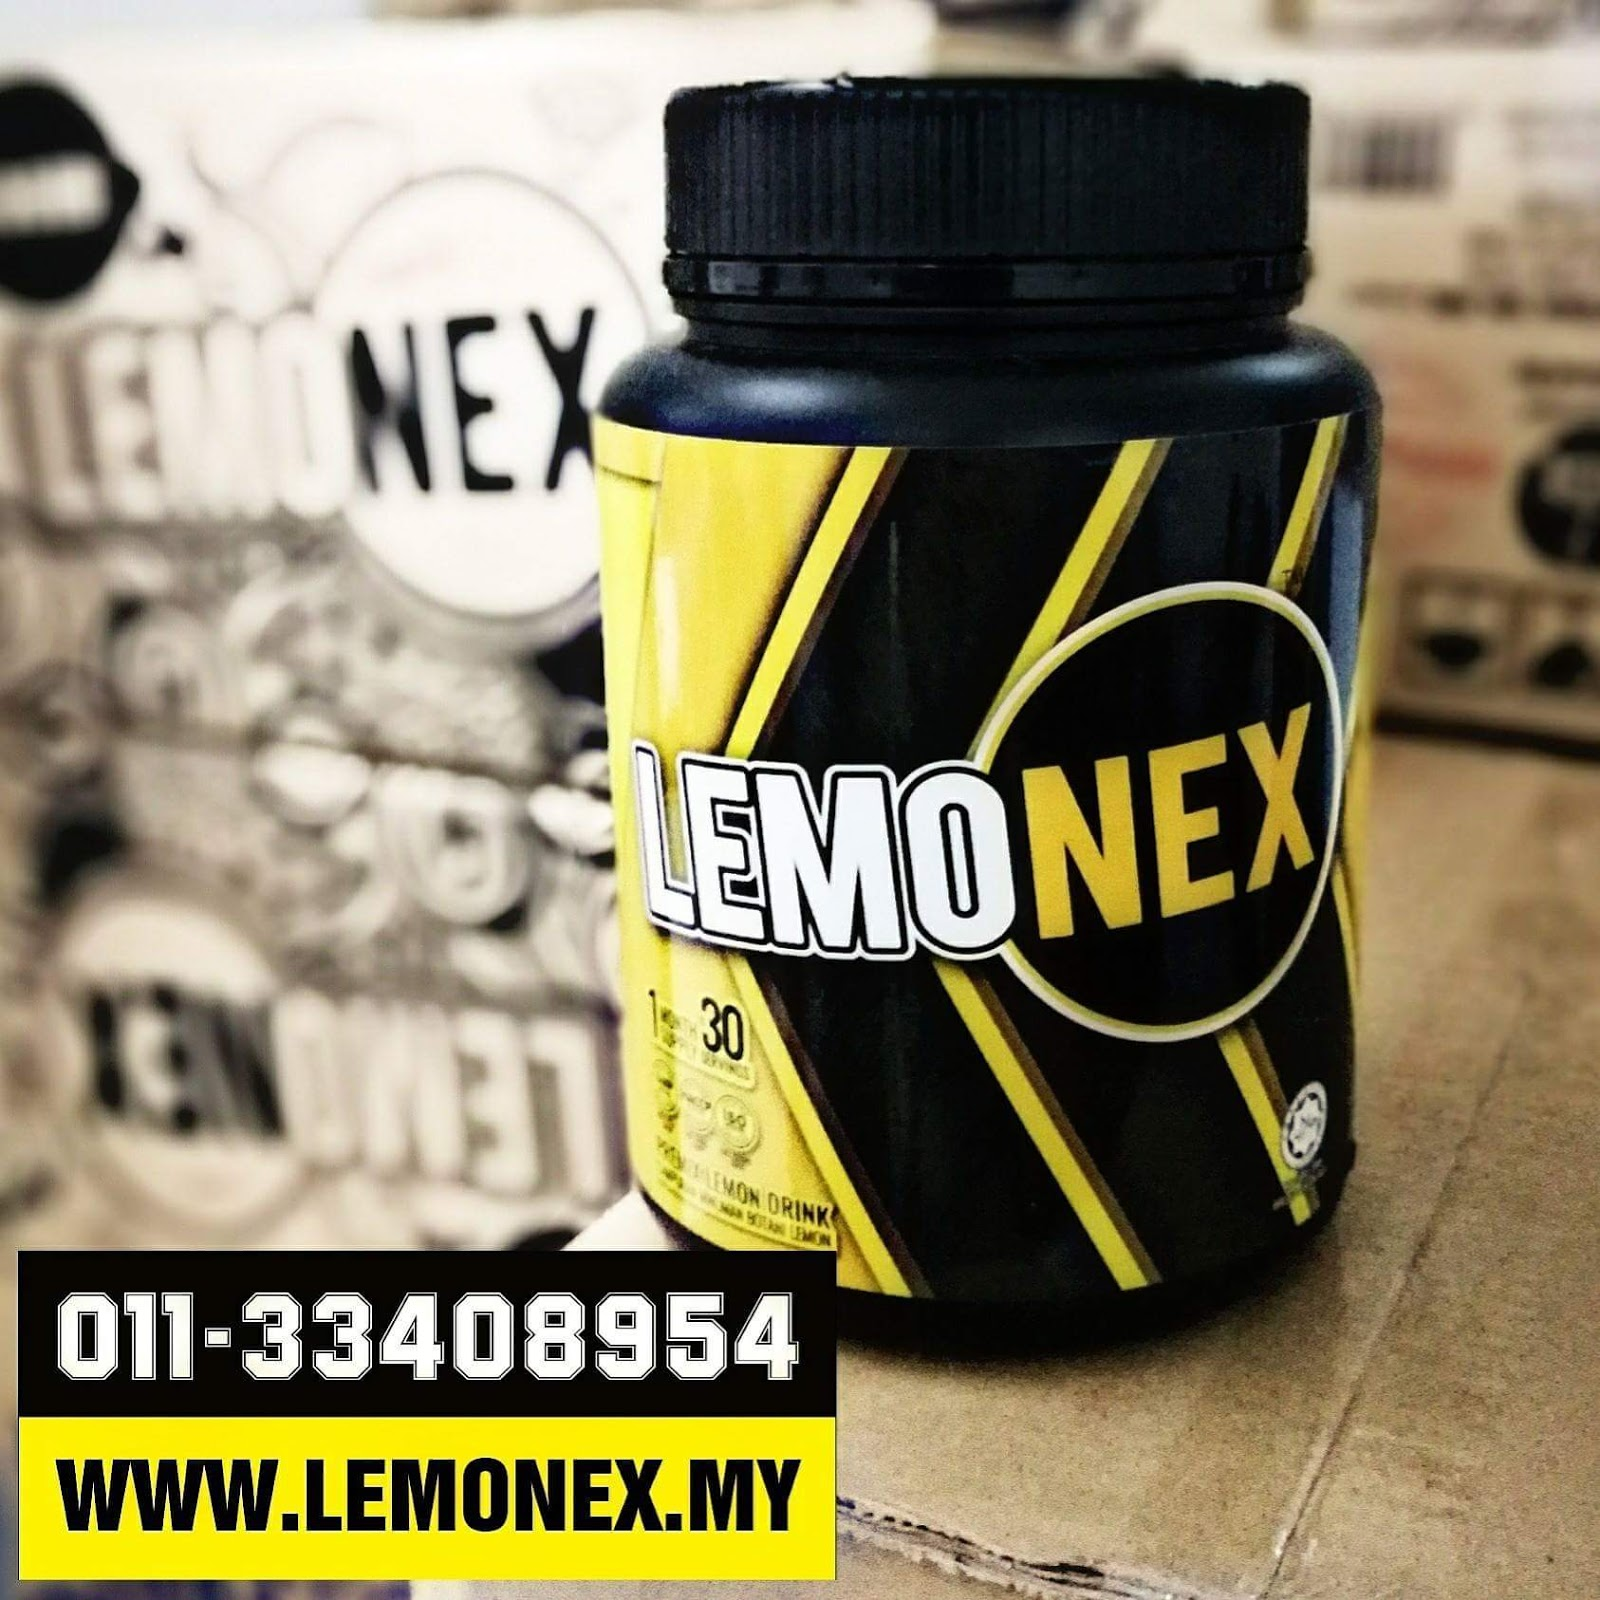 Turunkan Berat Badan dengan Konsumsi Air Lemon Setiap Hari